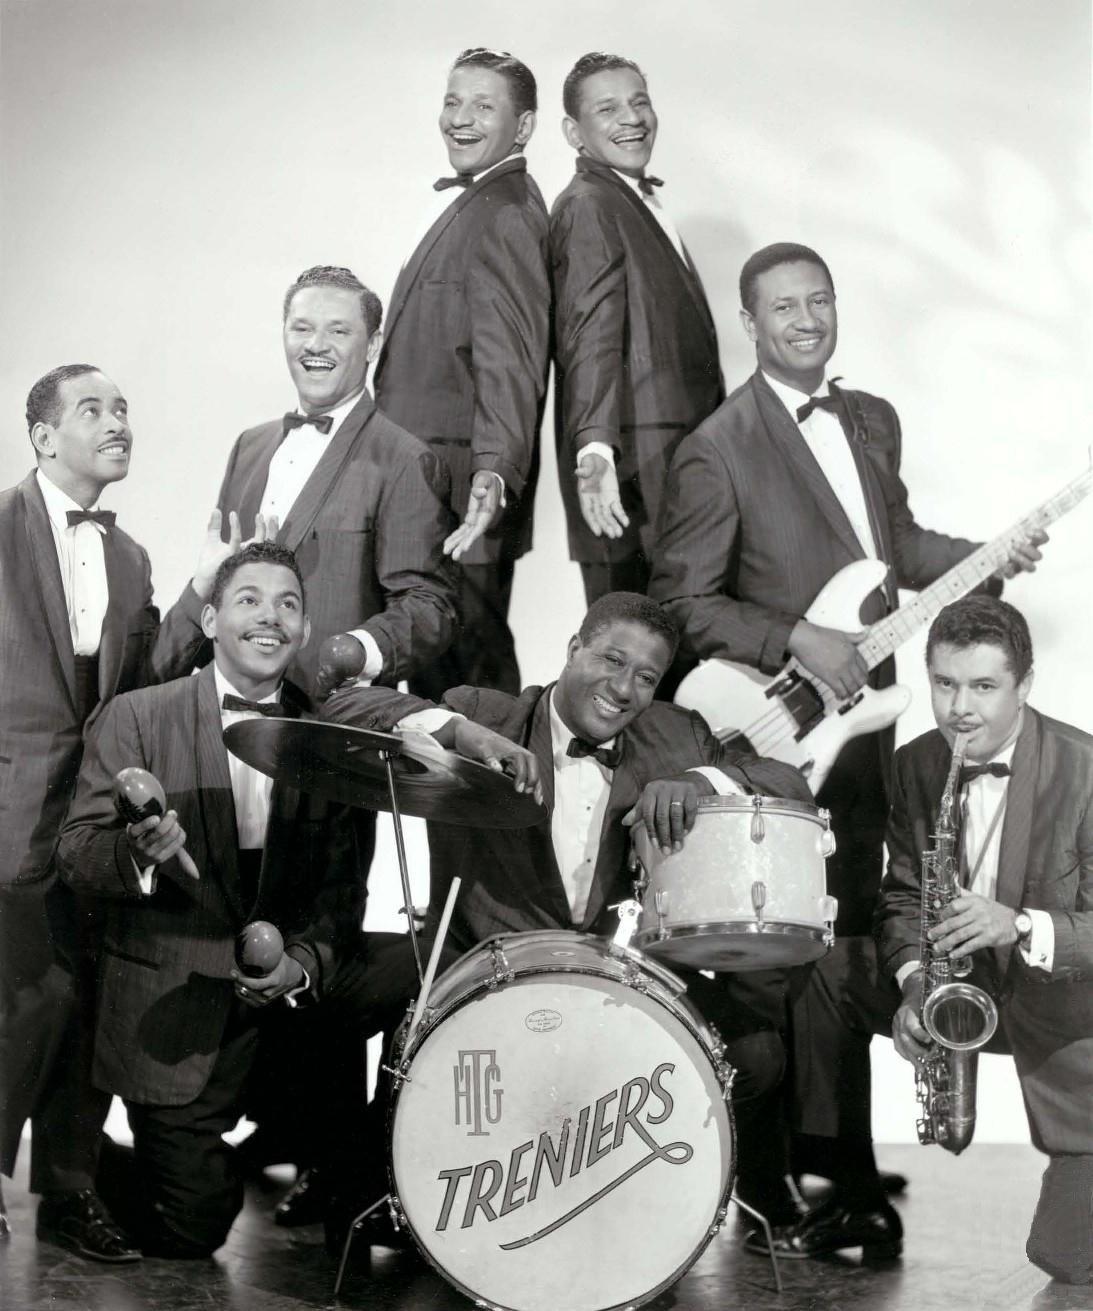 Late 1950s<br><small>Clockwise from left: Gene Gilbeaux (piano), Buddy Trenier, Cliff Trenier, Claude Trenier, Jimmy Johnson bass, Don Hill (sax), Henry (Tucker) Green (drums), Skip Trenier</small>